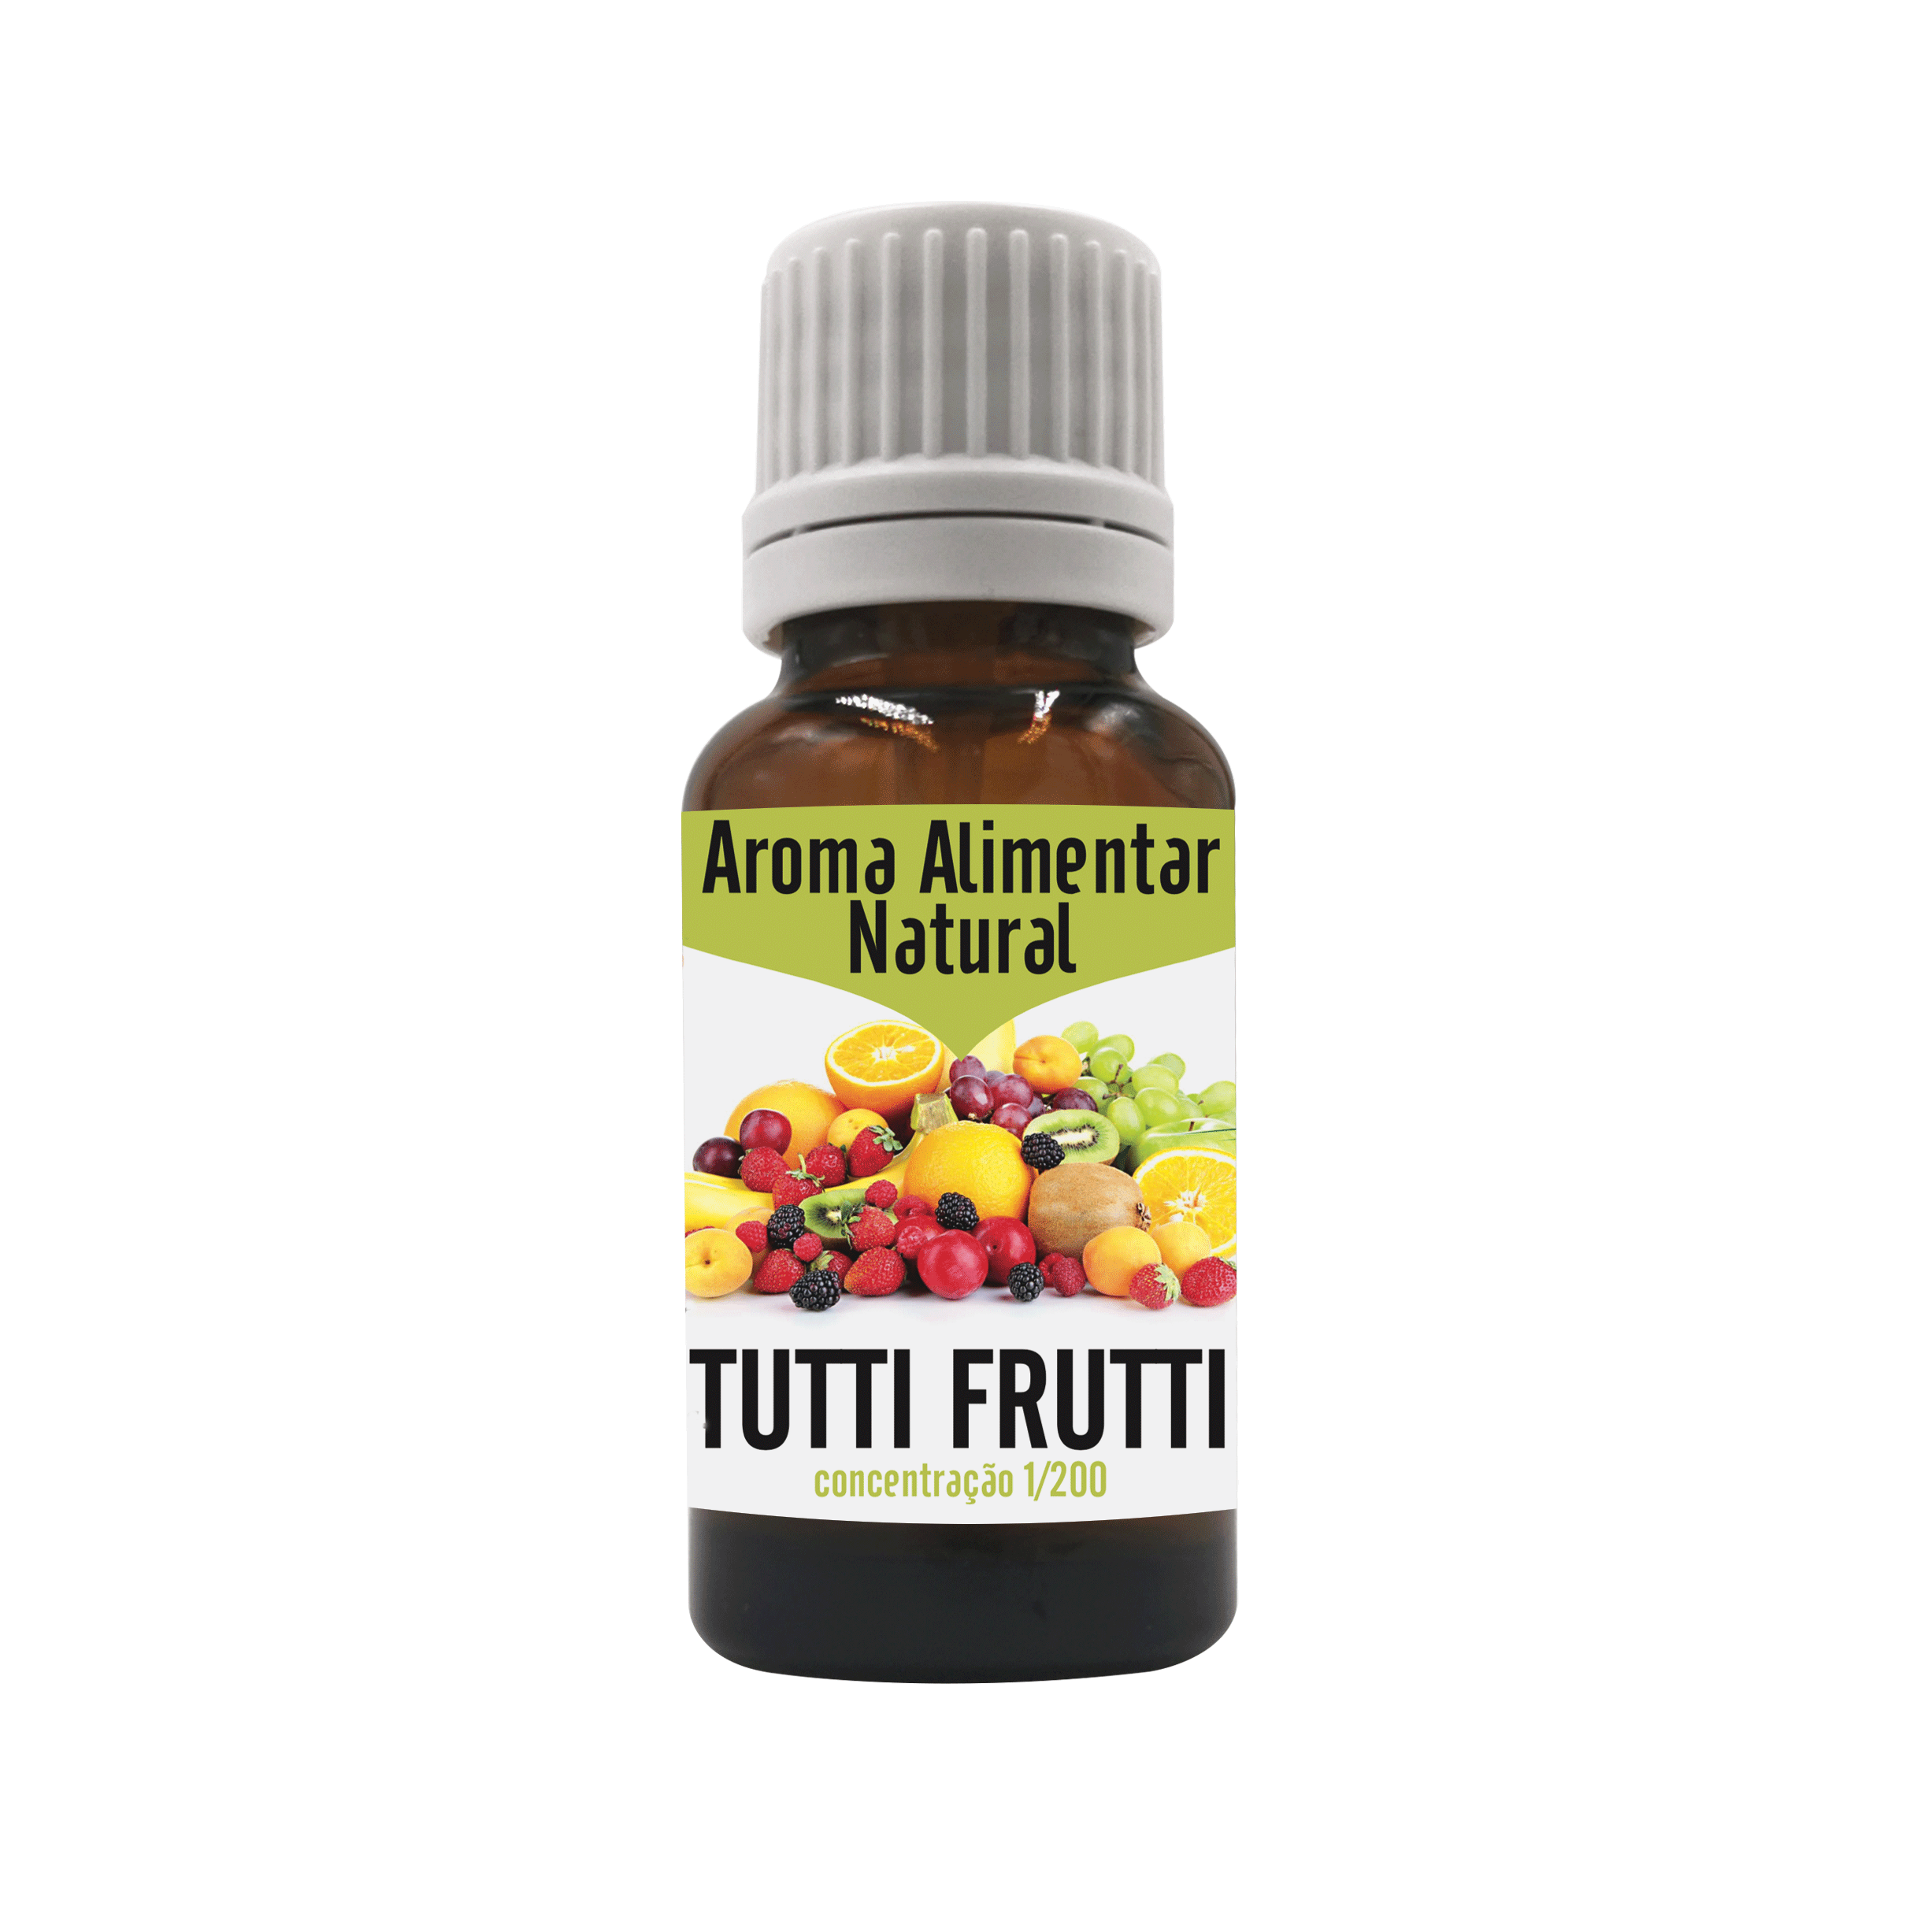 Aroma Alimentar de Tutti-frutti